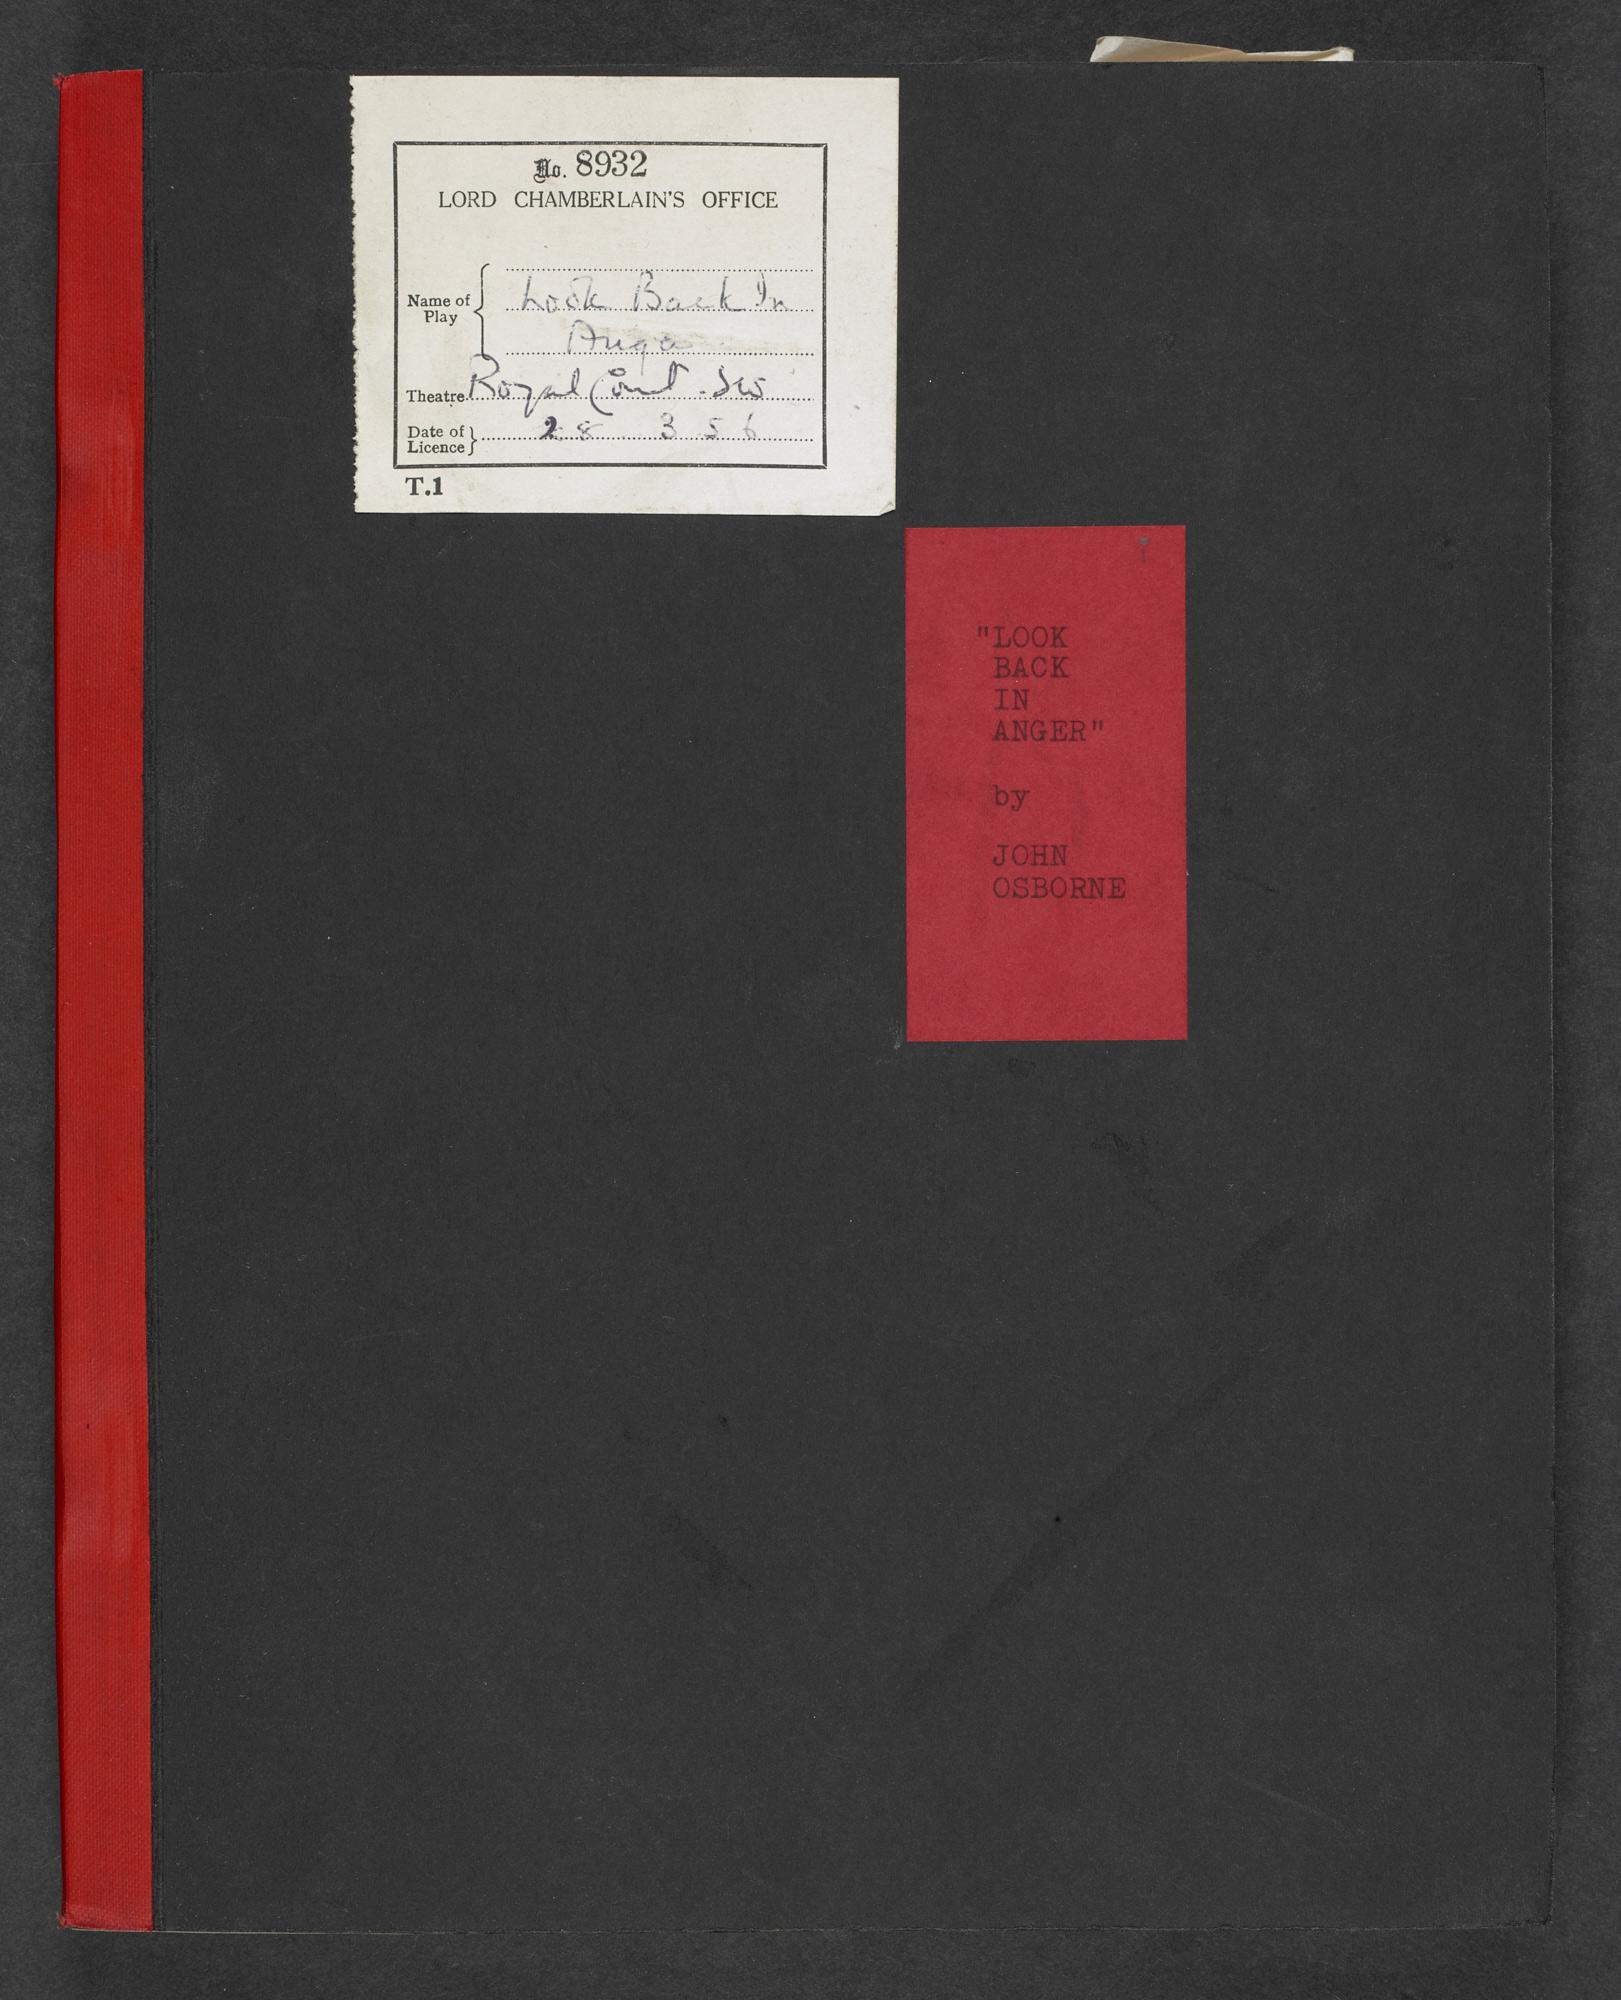 Censored script of Look Back in Anger by John Osborne - The British